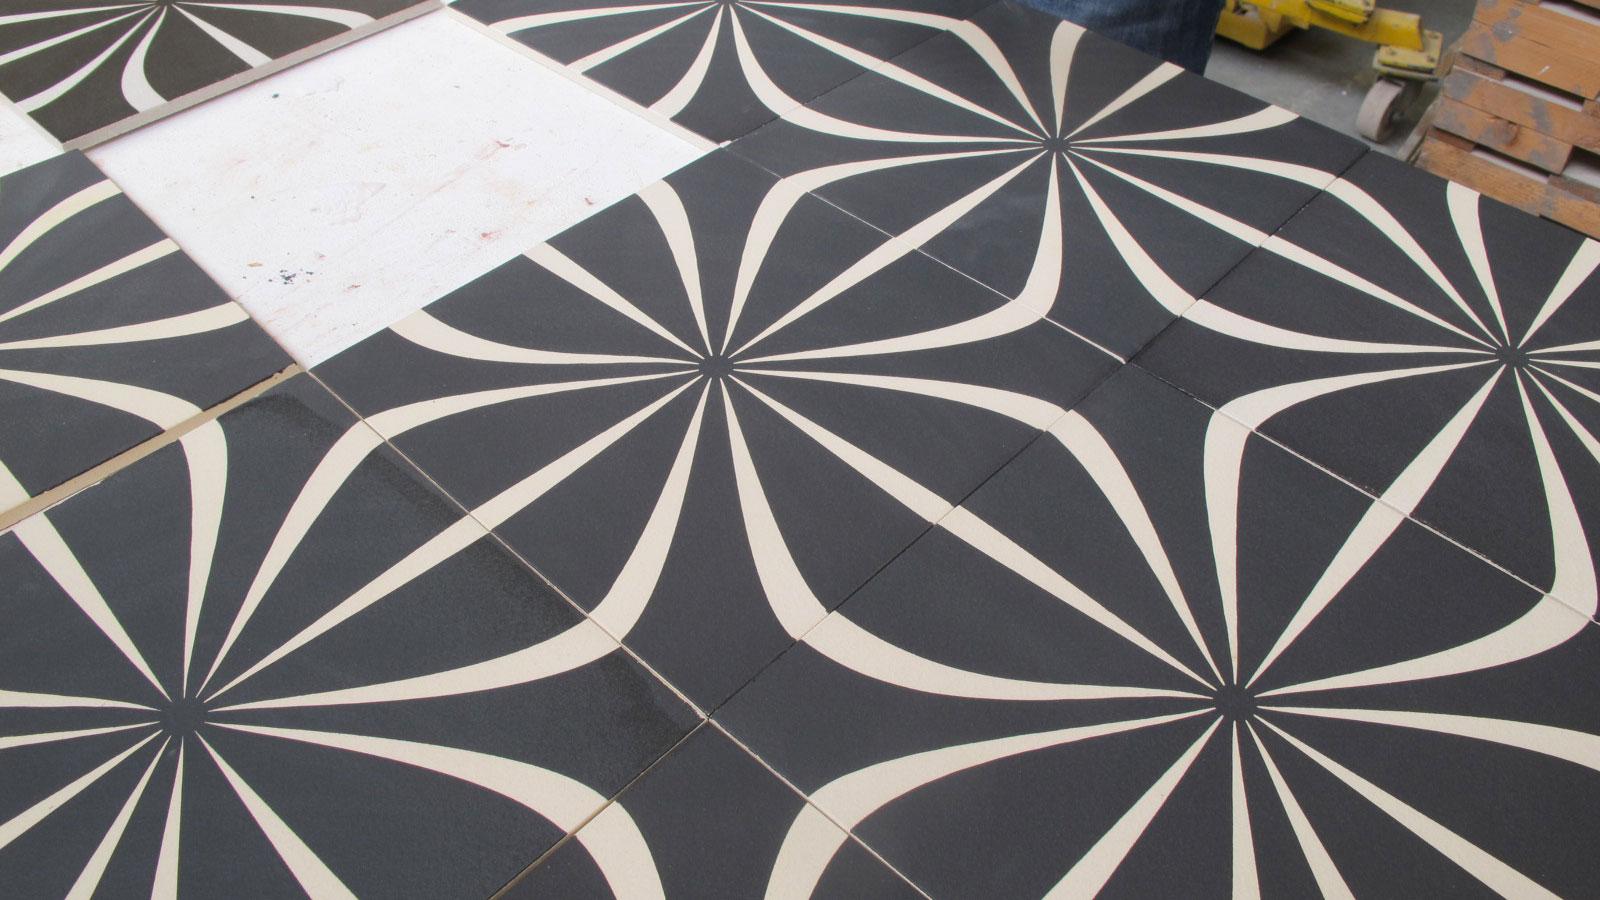 normandyCeramics_azulejosproject_06leg